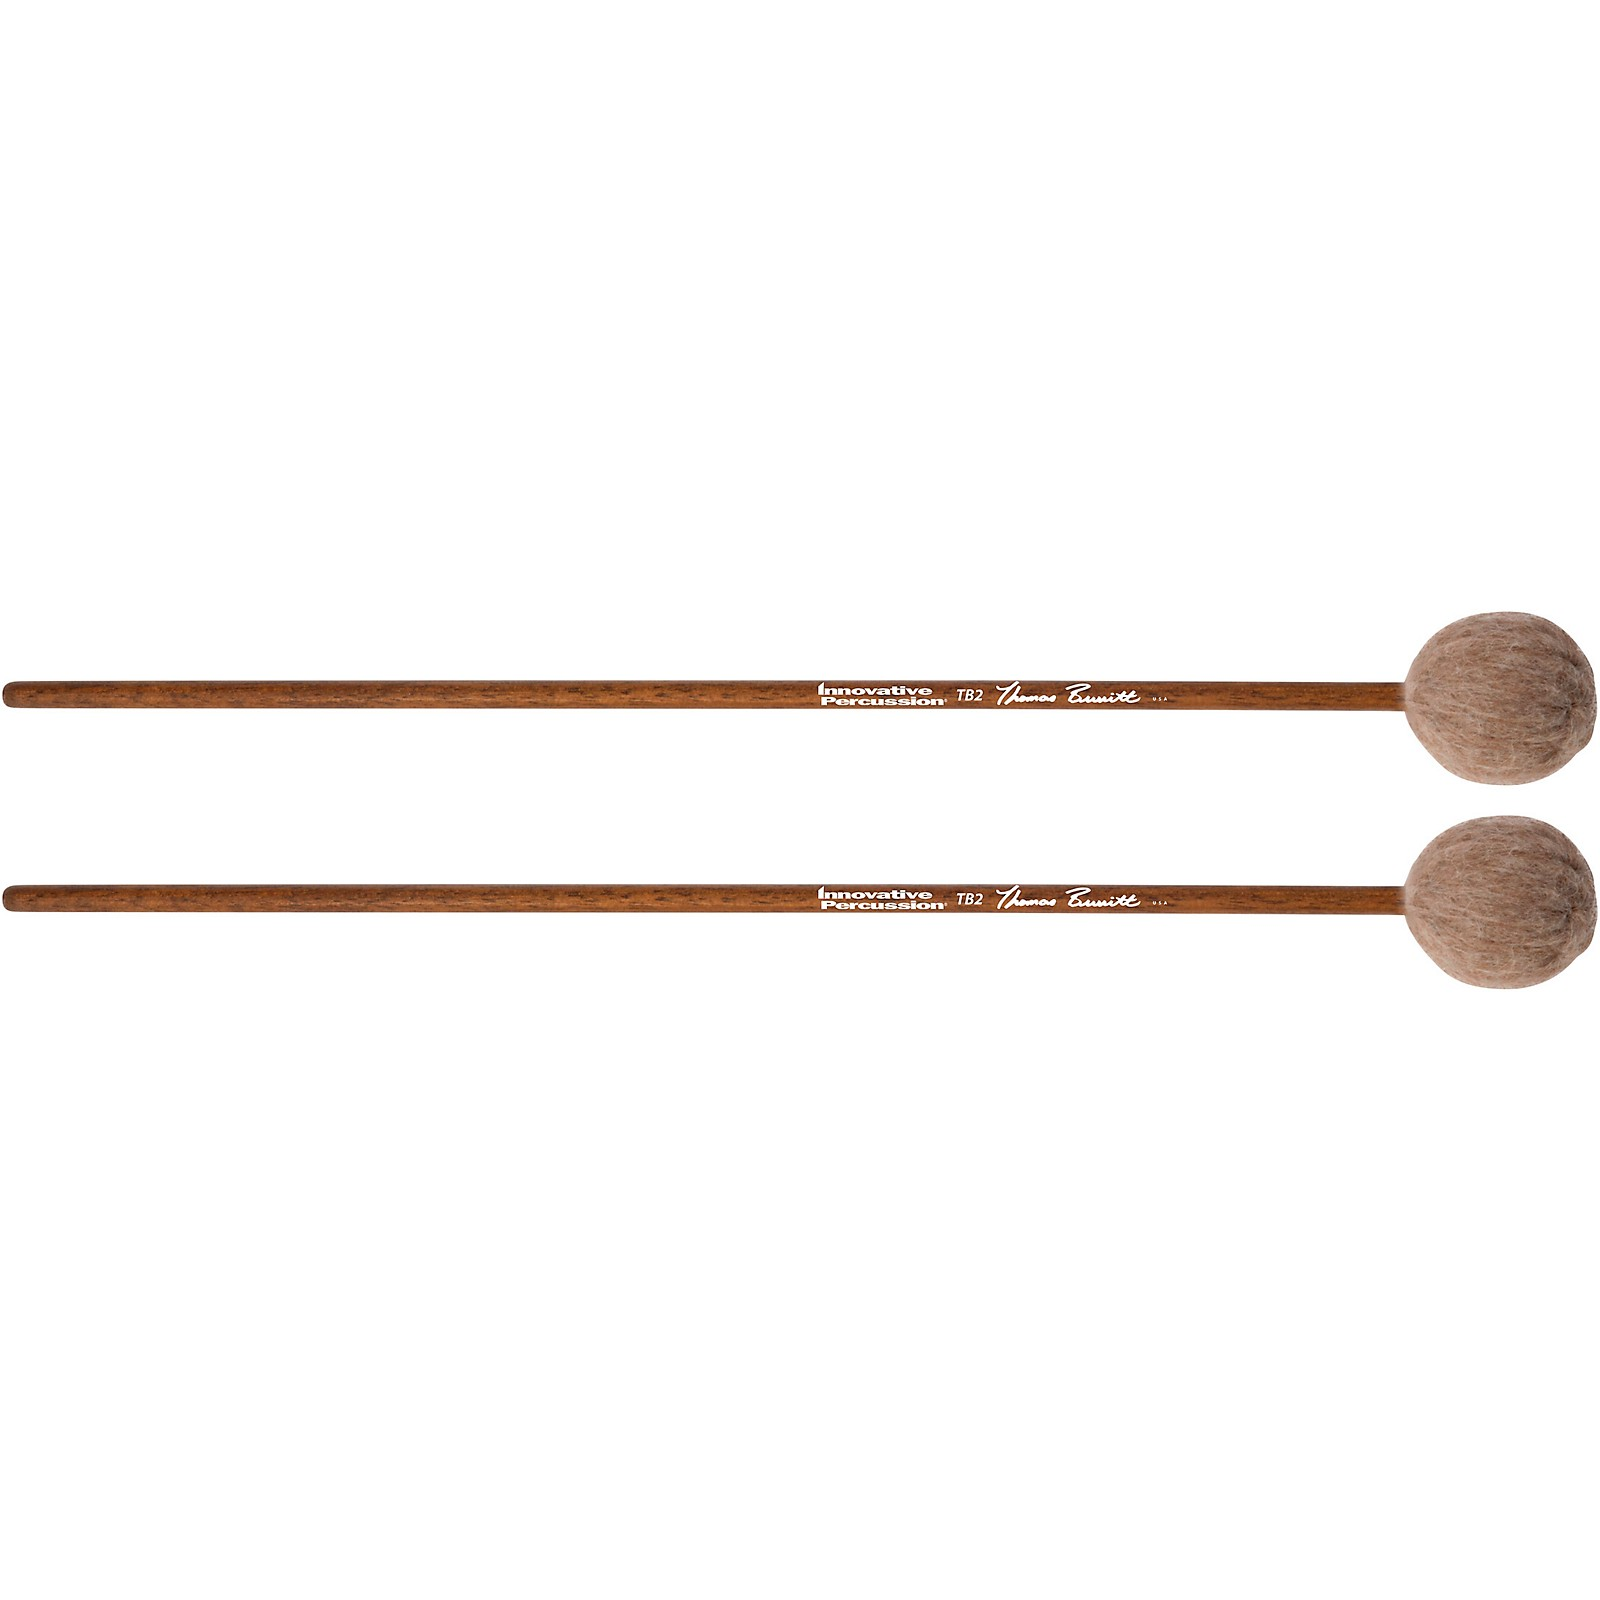 Innovative Percussion Thomas Burritt Series Ramin Marimba Mallets